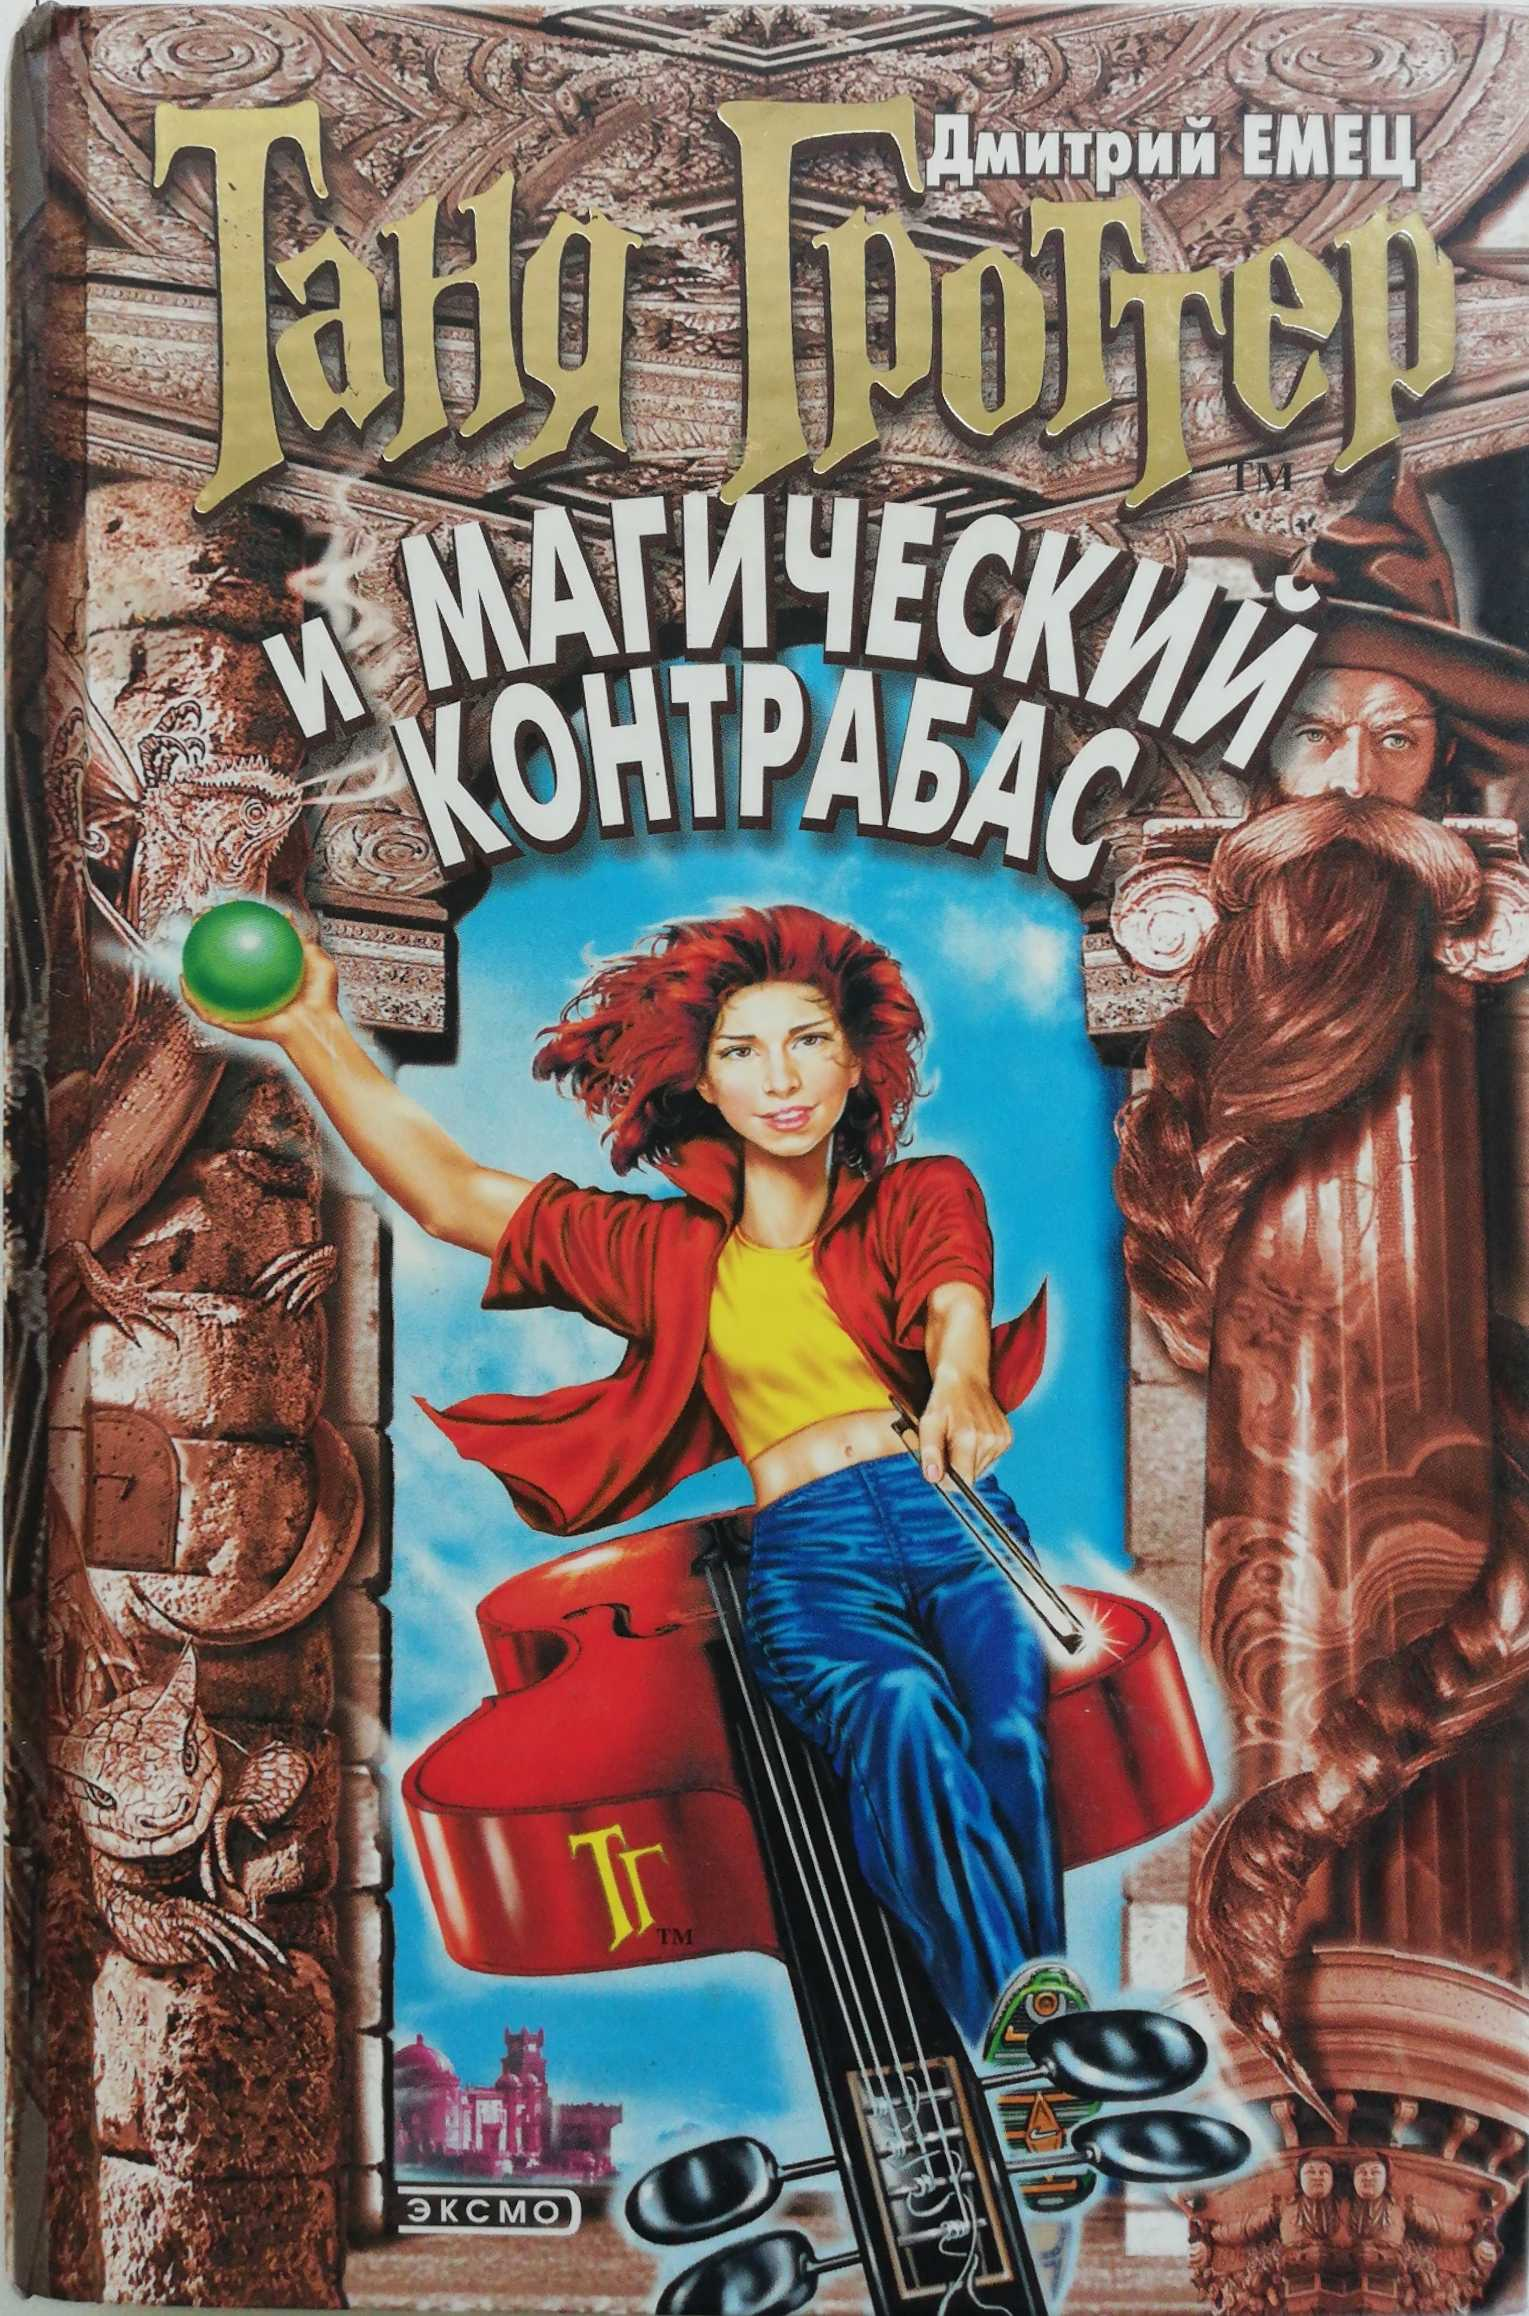 Емец Дмитрий Александрович Таня Гроттер и магический контрабас дмитрий емец таня гроттер и магический контрабас